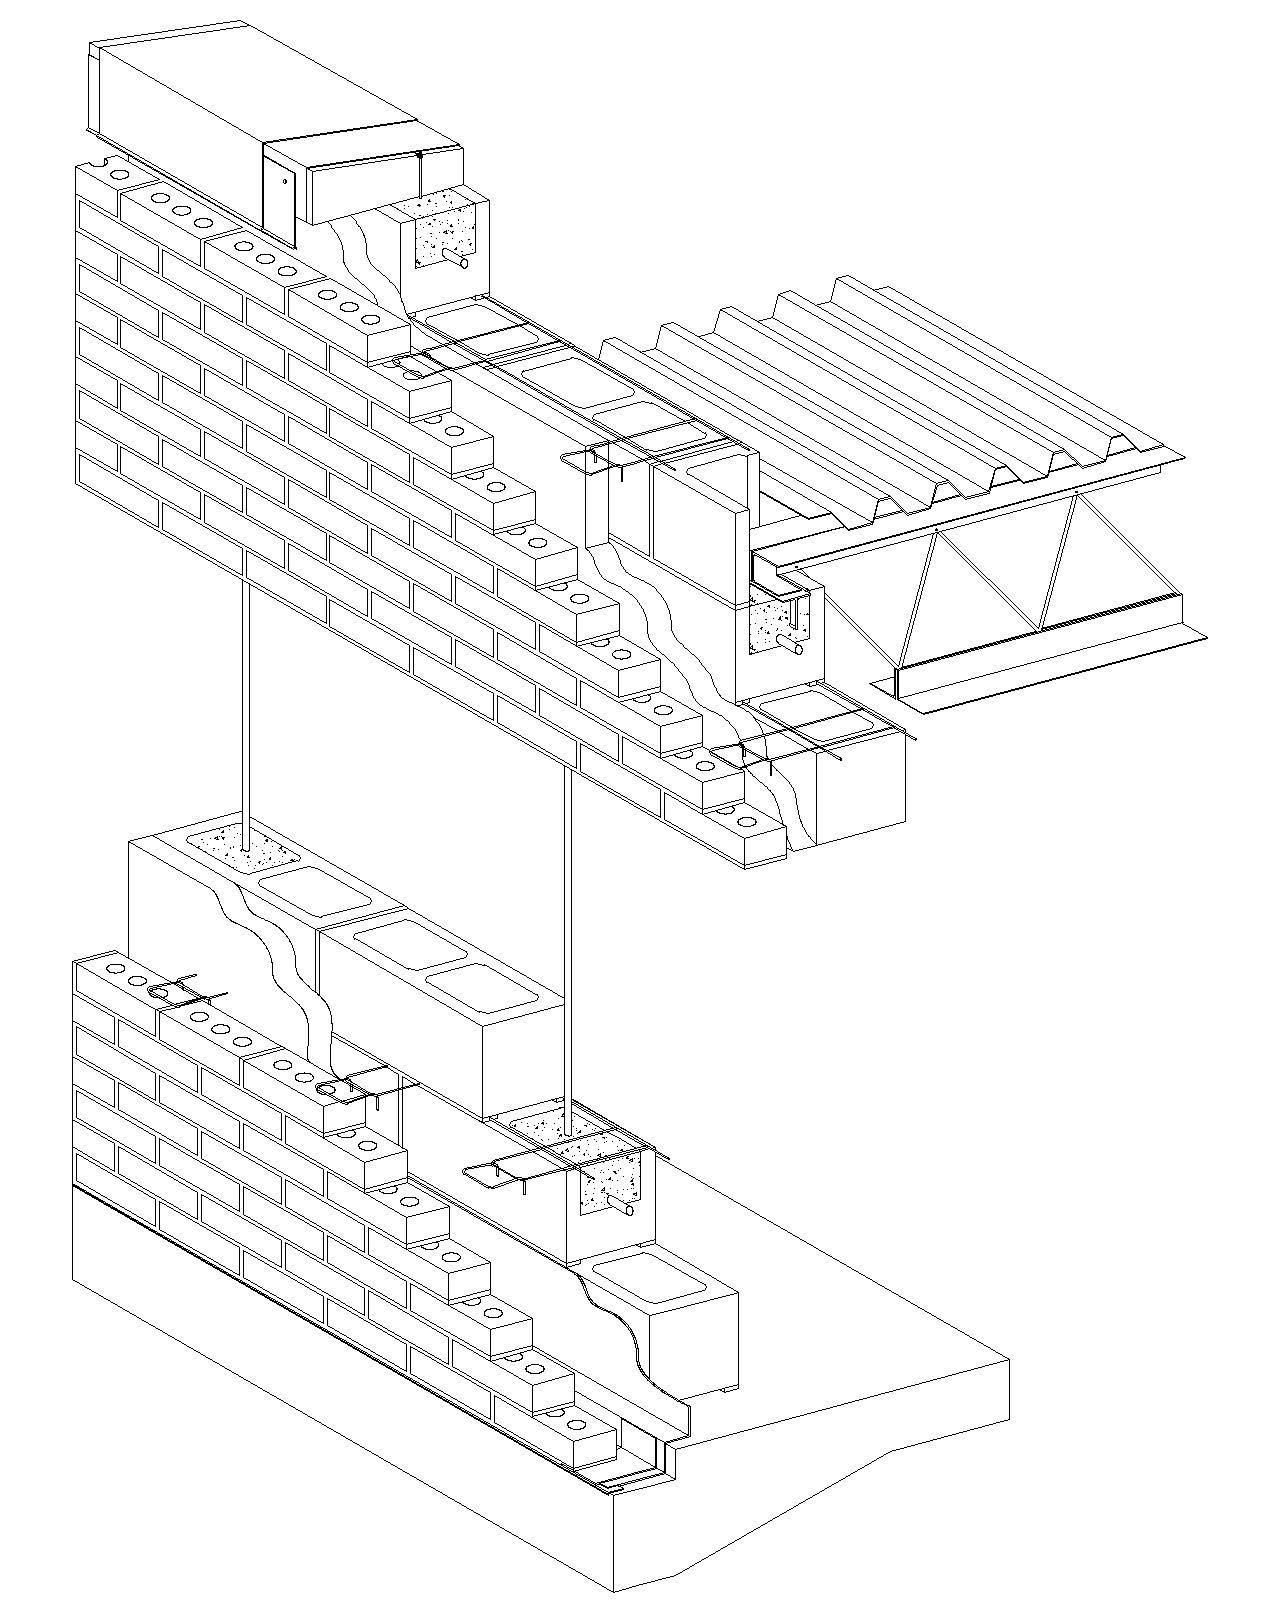 1280x1600 Cavity Wall Brick Veneerreinforced Concrete Block